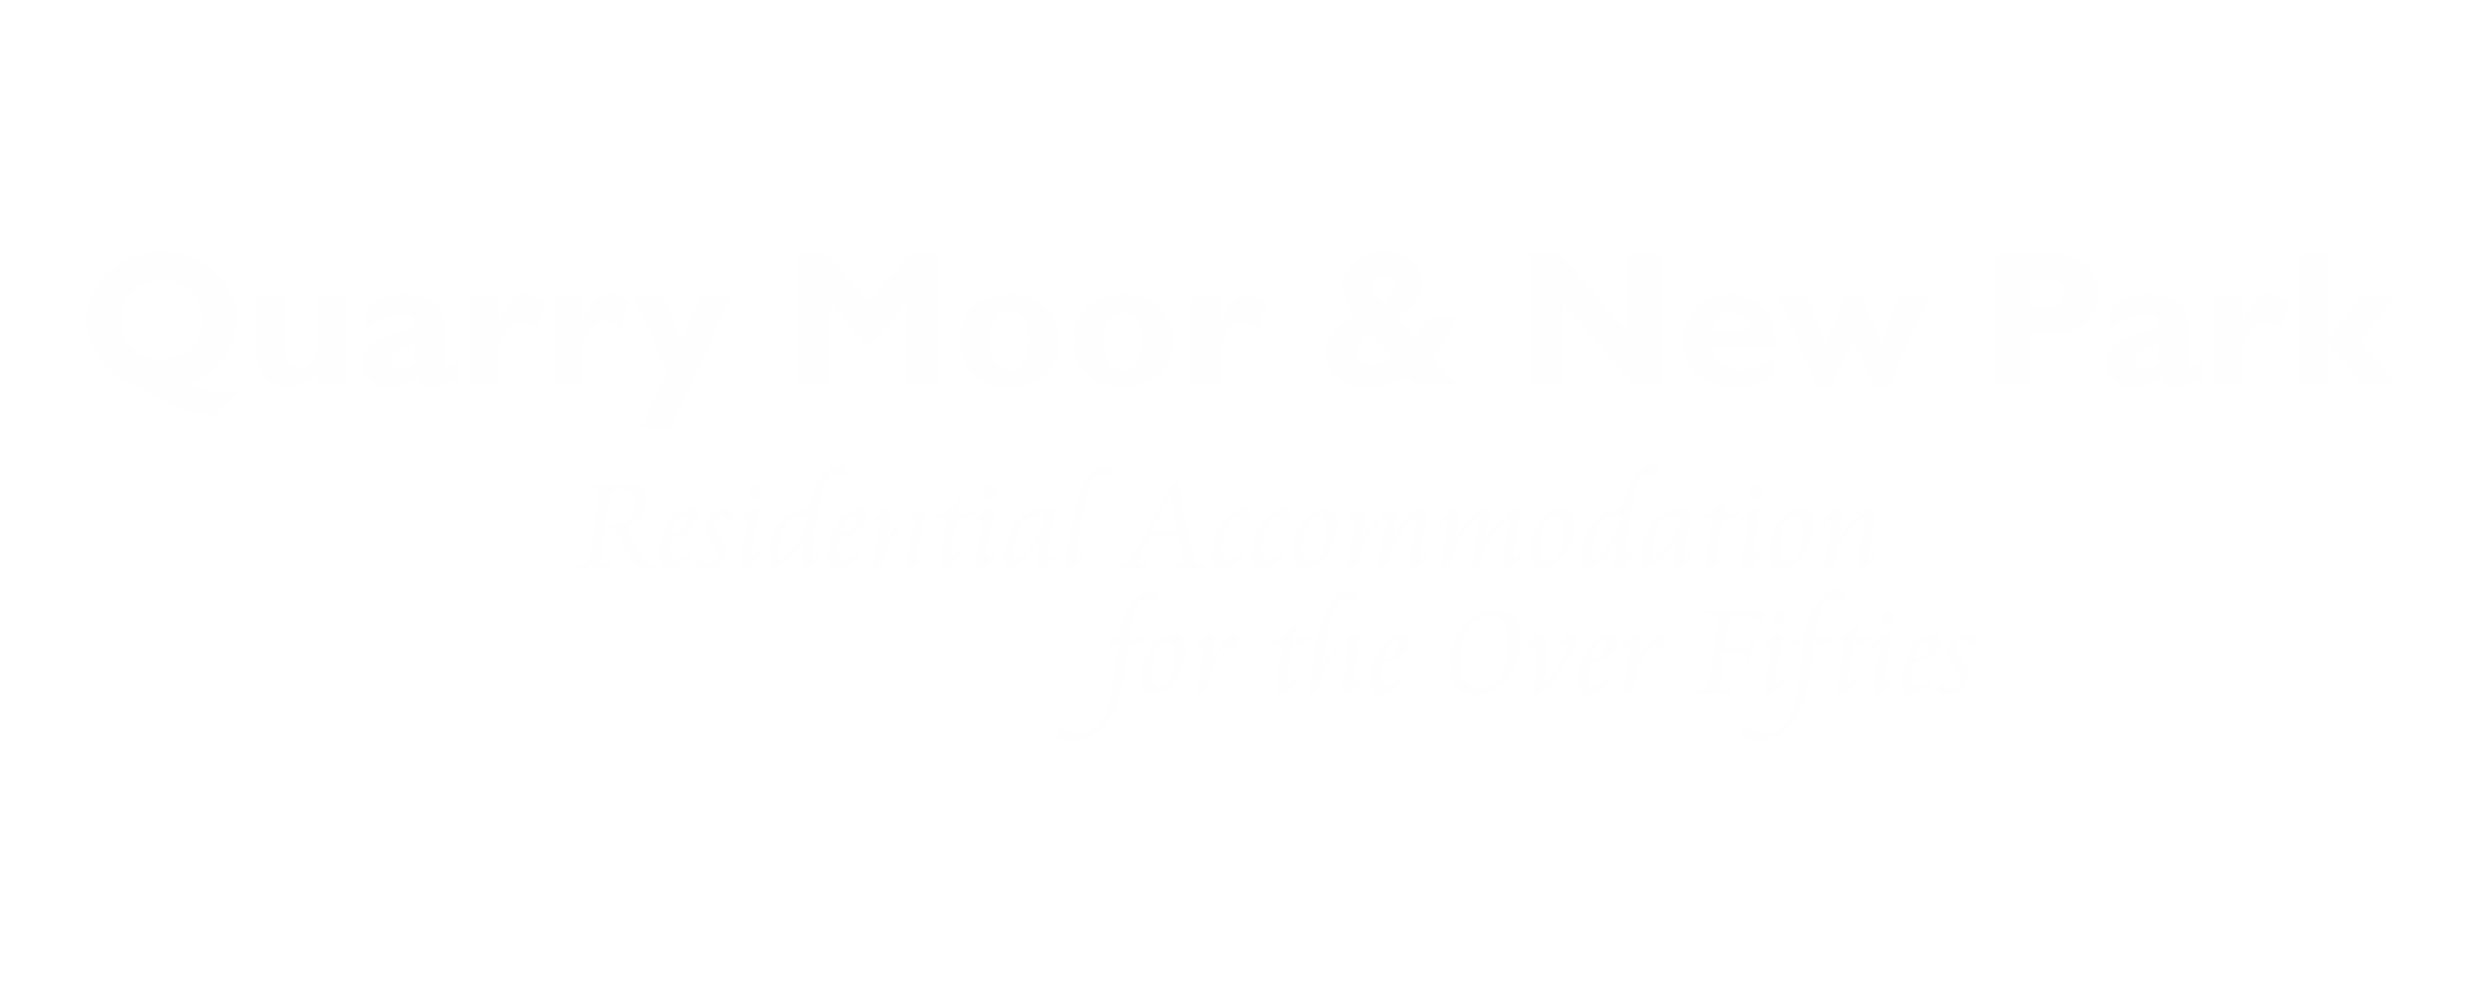 Quarry Moor & New Park Landscape Logo WHITE